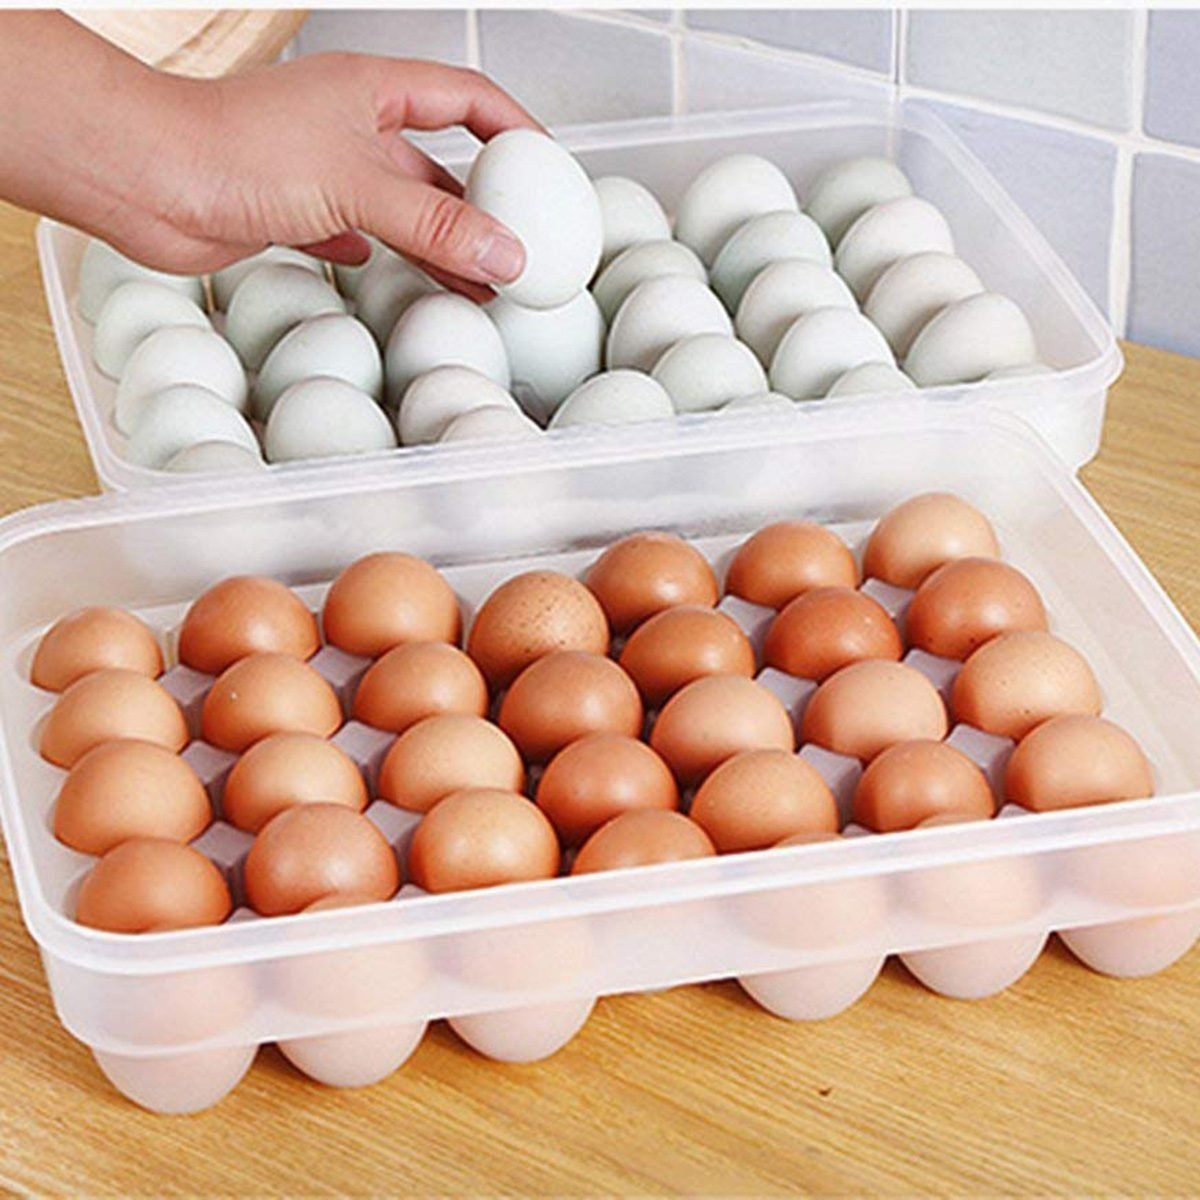 leoyoubei Large capacity Eggs Food Storage Organizer for Kitchen Restaurant Fridge Storage